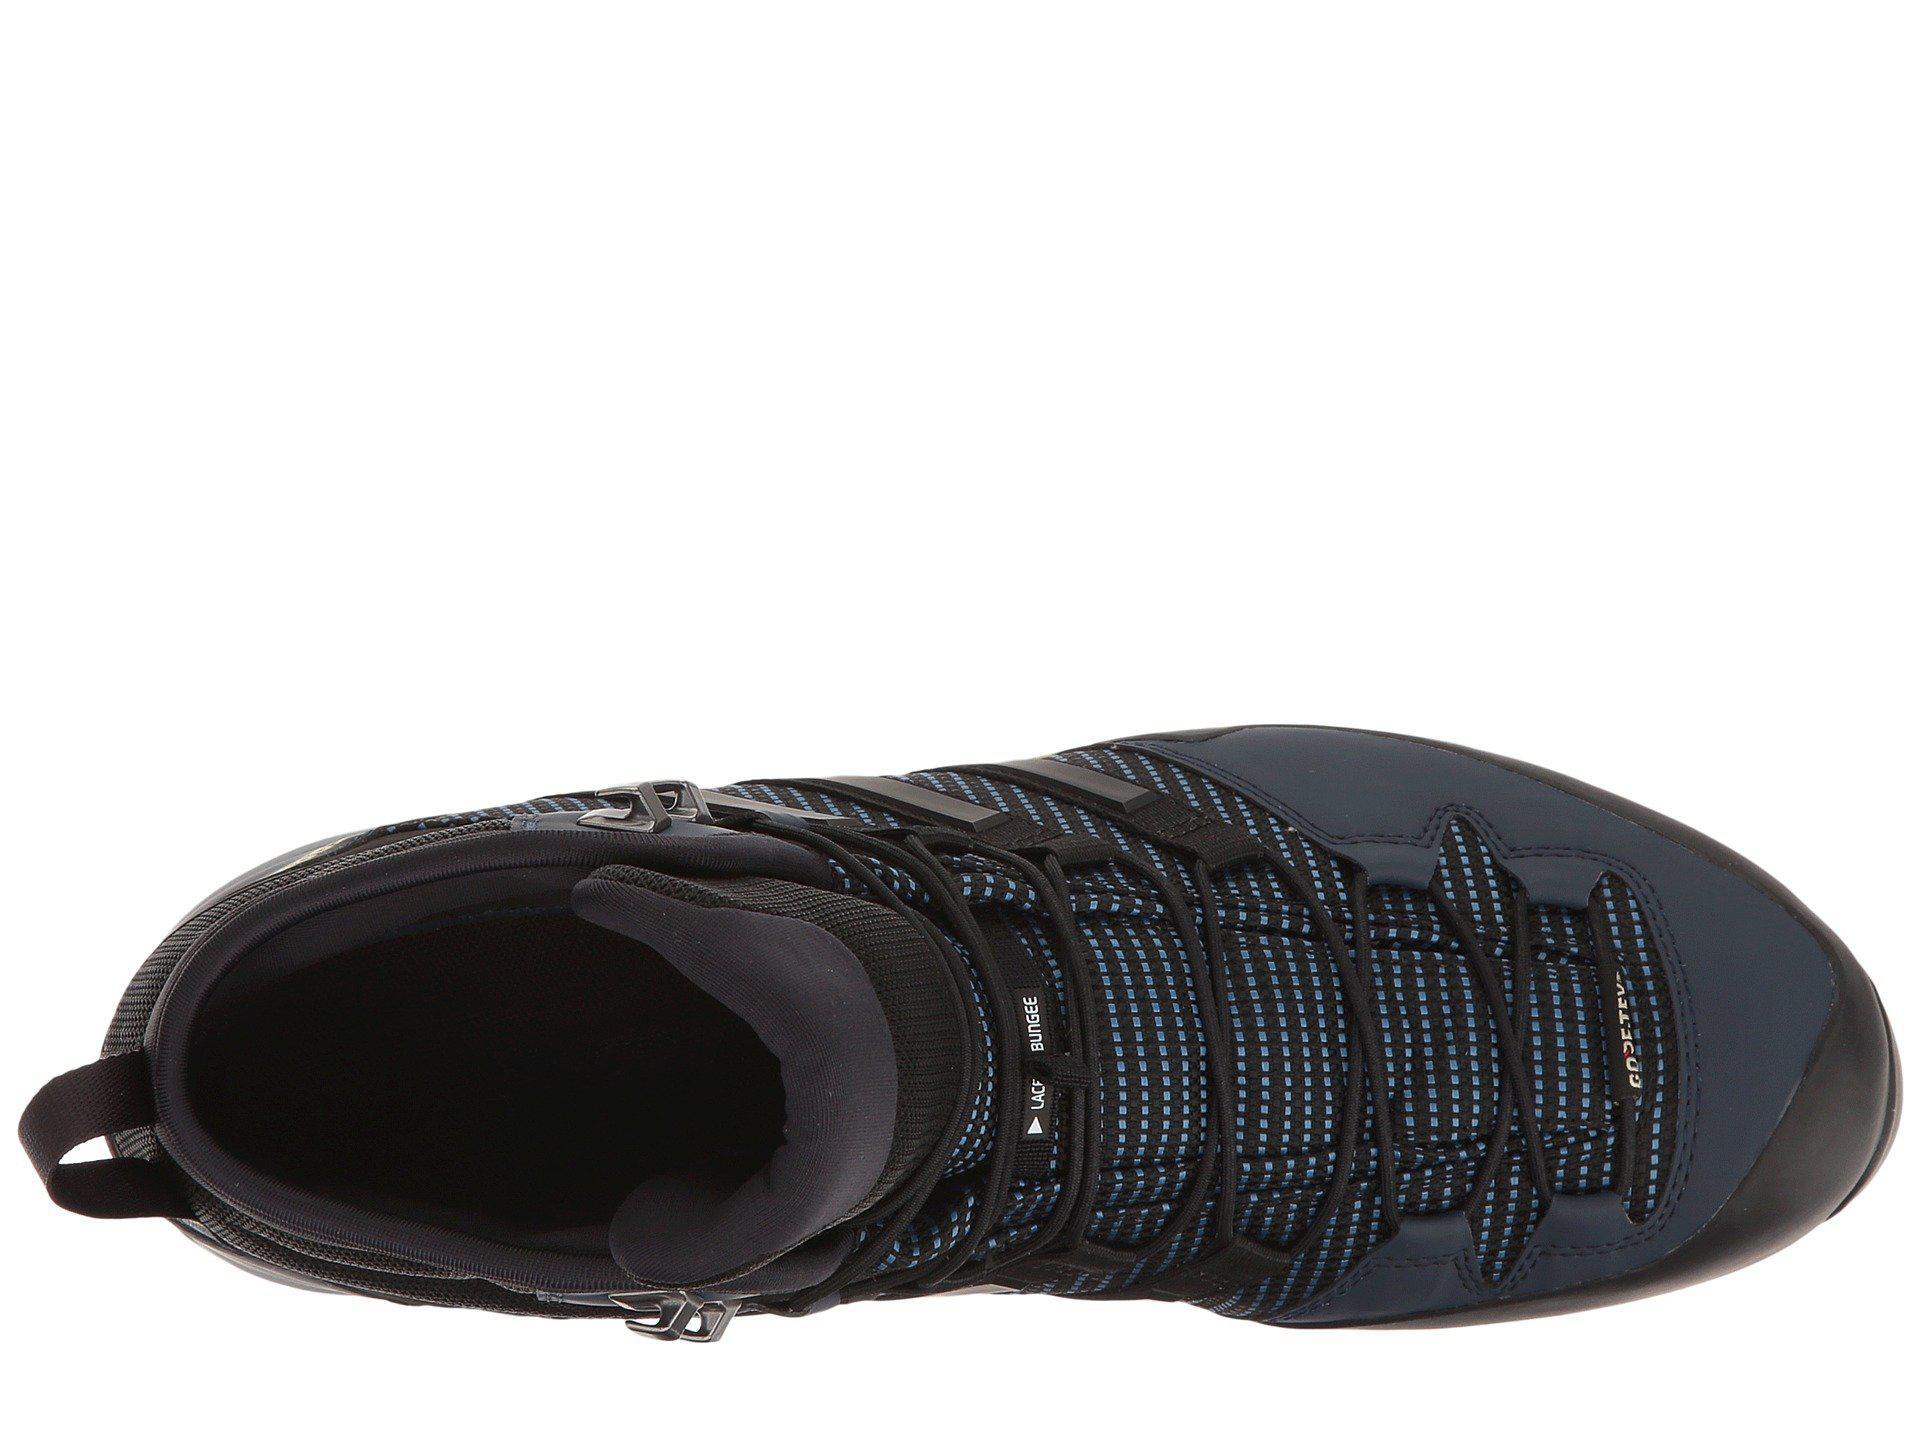 27fc66a7c Lyst - adidas Originals Terrex Scope High Gtx (core Blue black ...